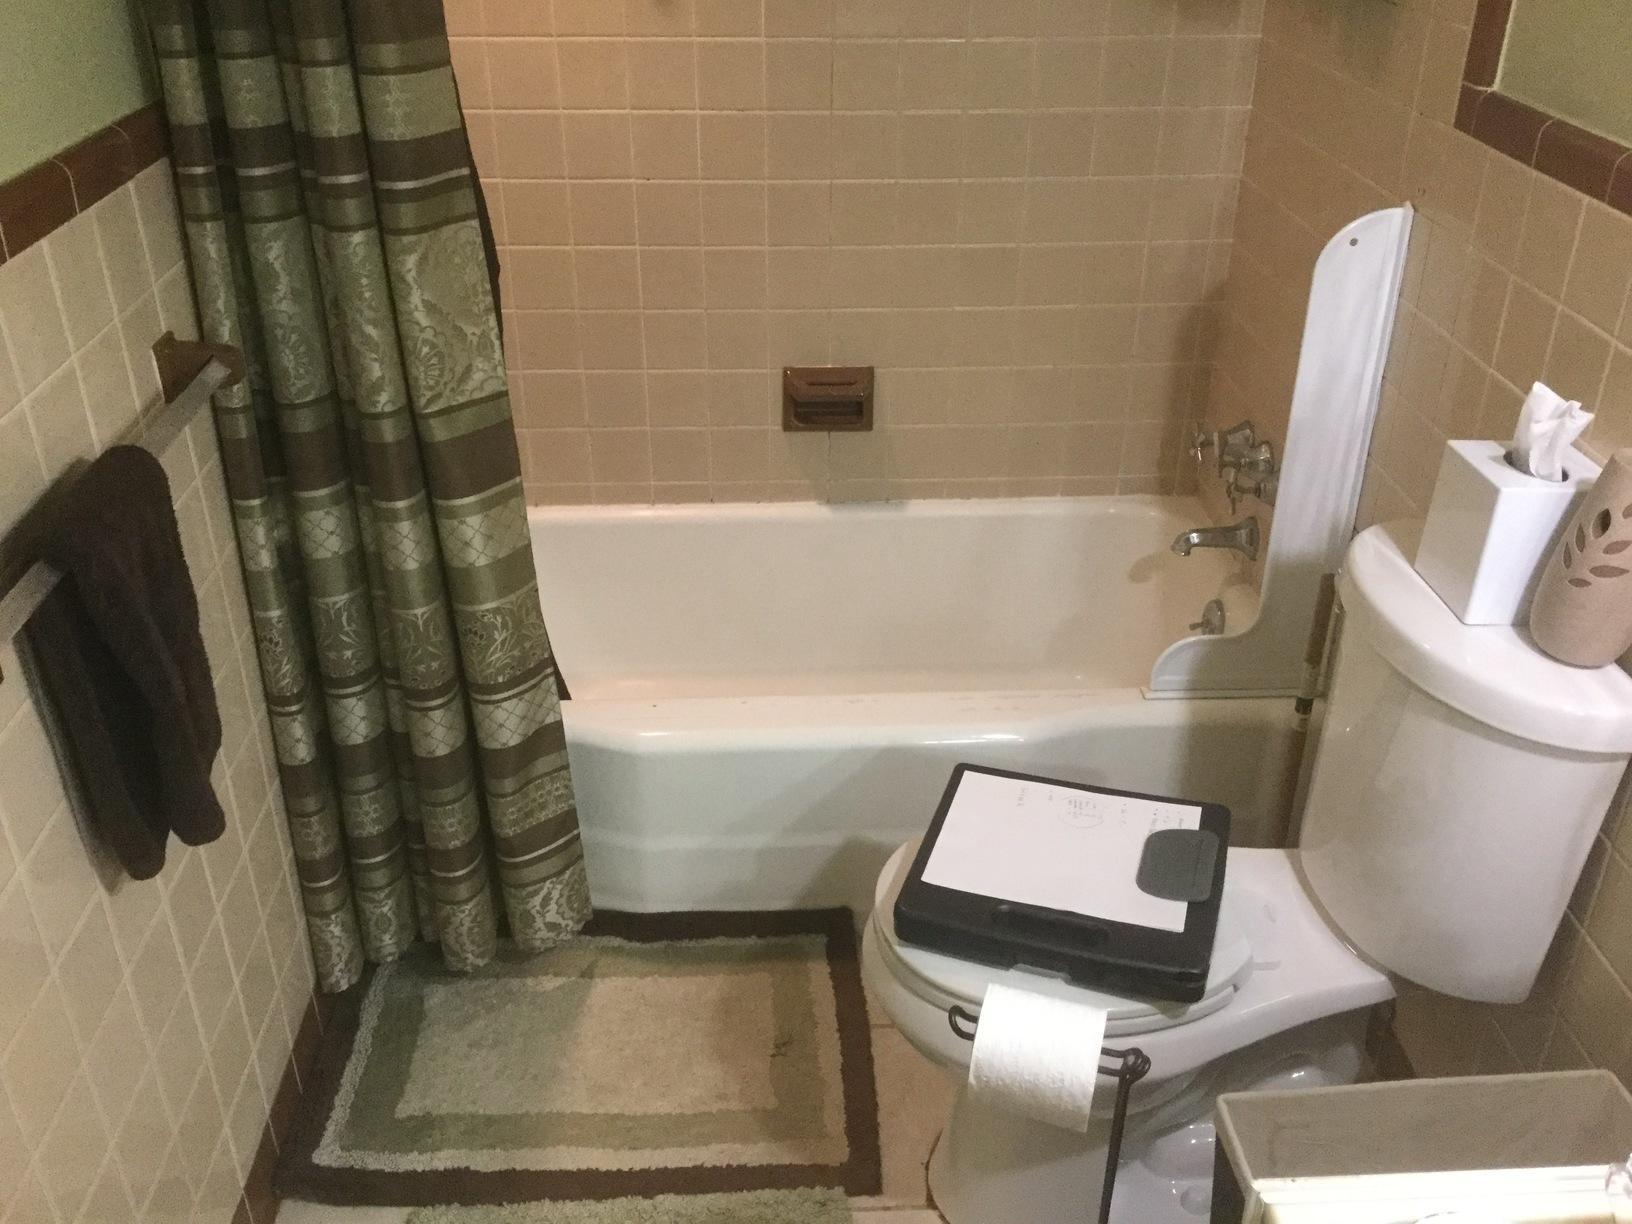 Bathroom Remodel in Toledo, Oh - Before Photo